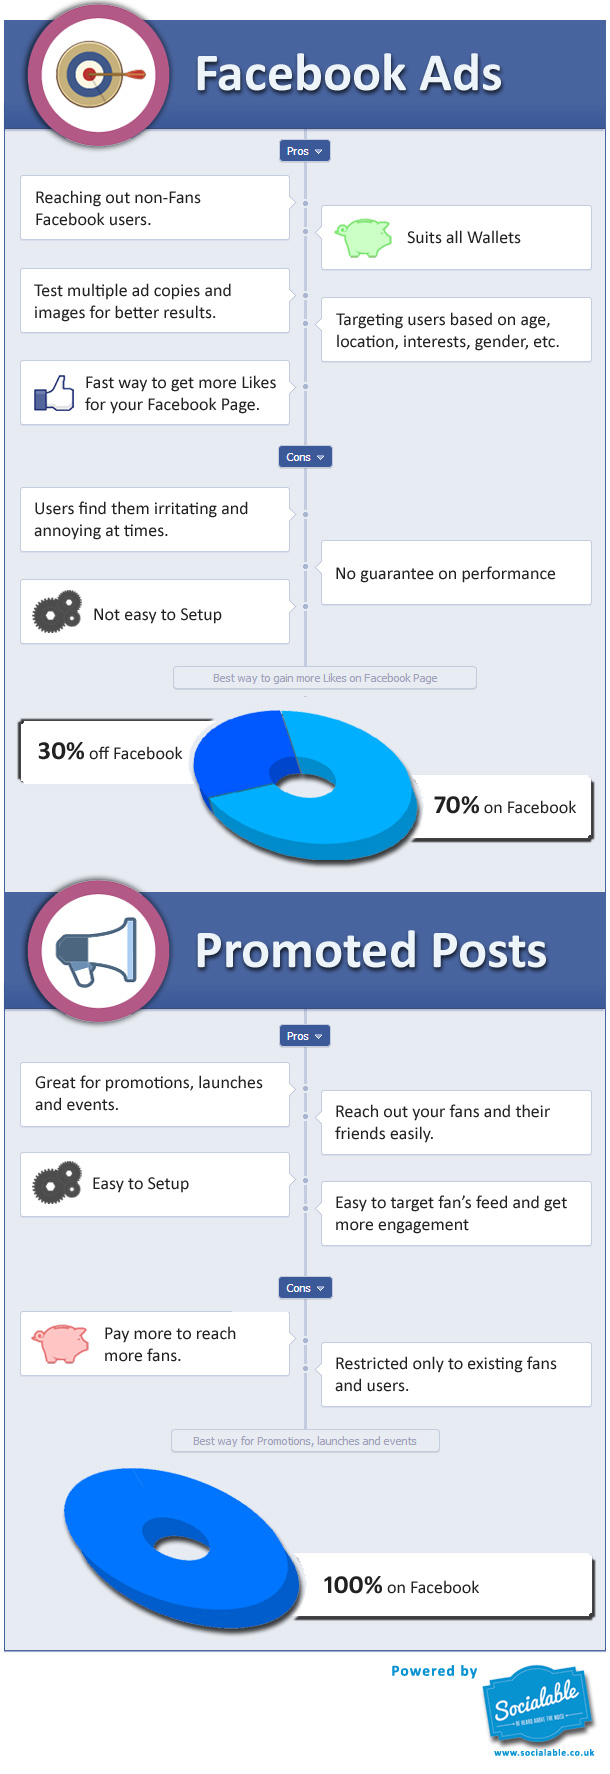 facebook-ads-promoted-posts